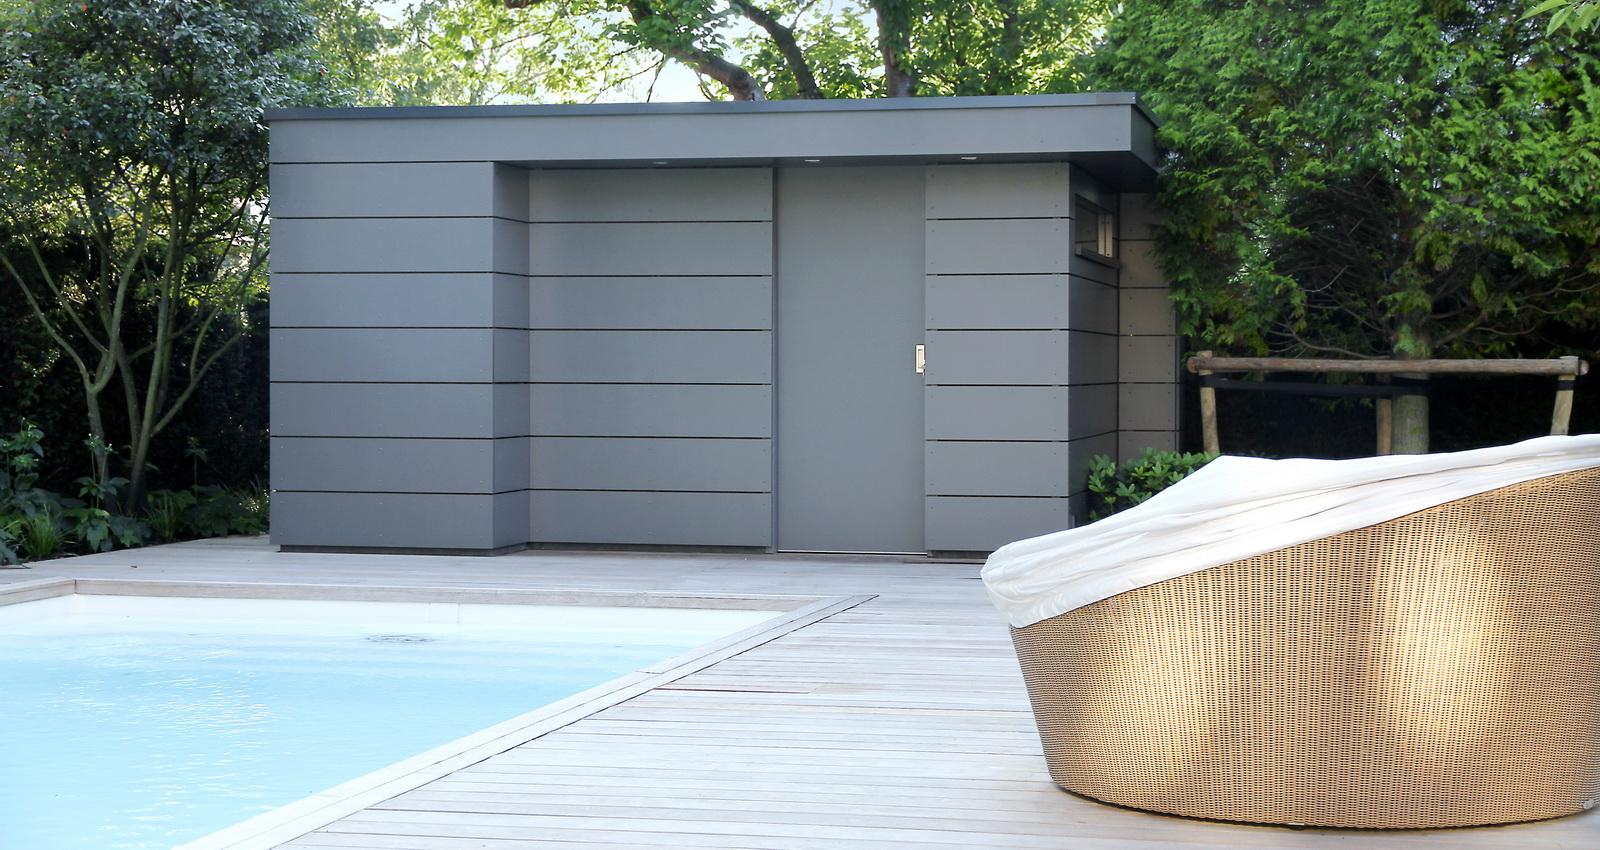 Gartenhaus box das kubus gartenhaus - Gartenhaus design ...